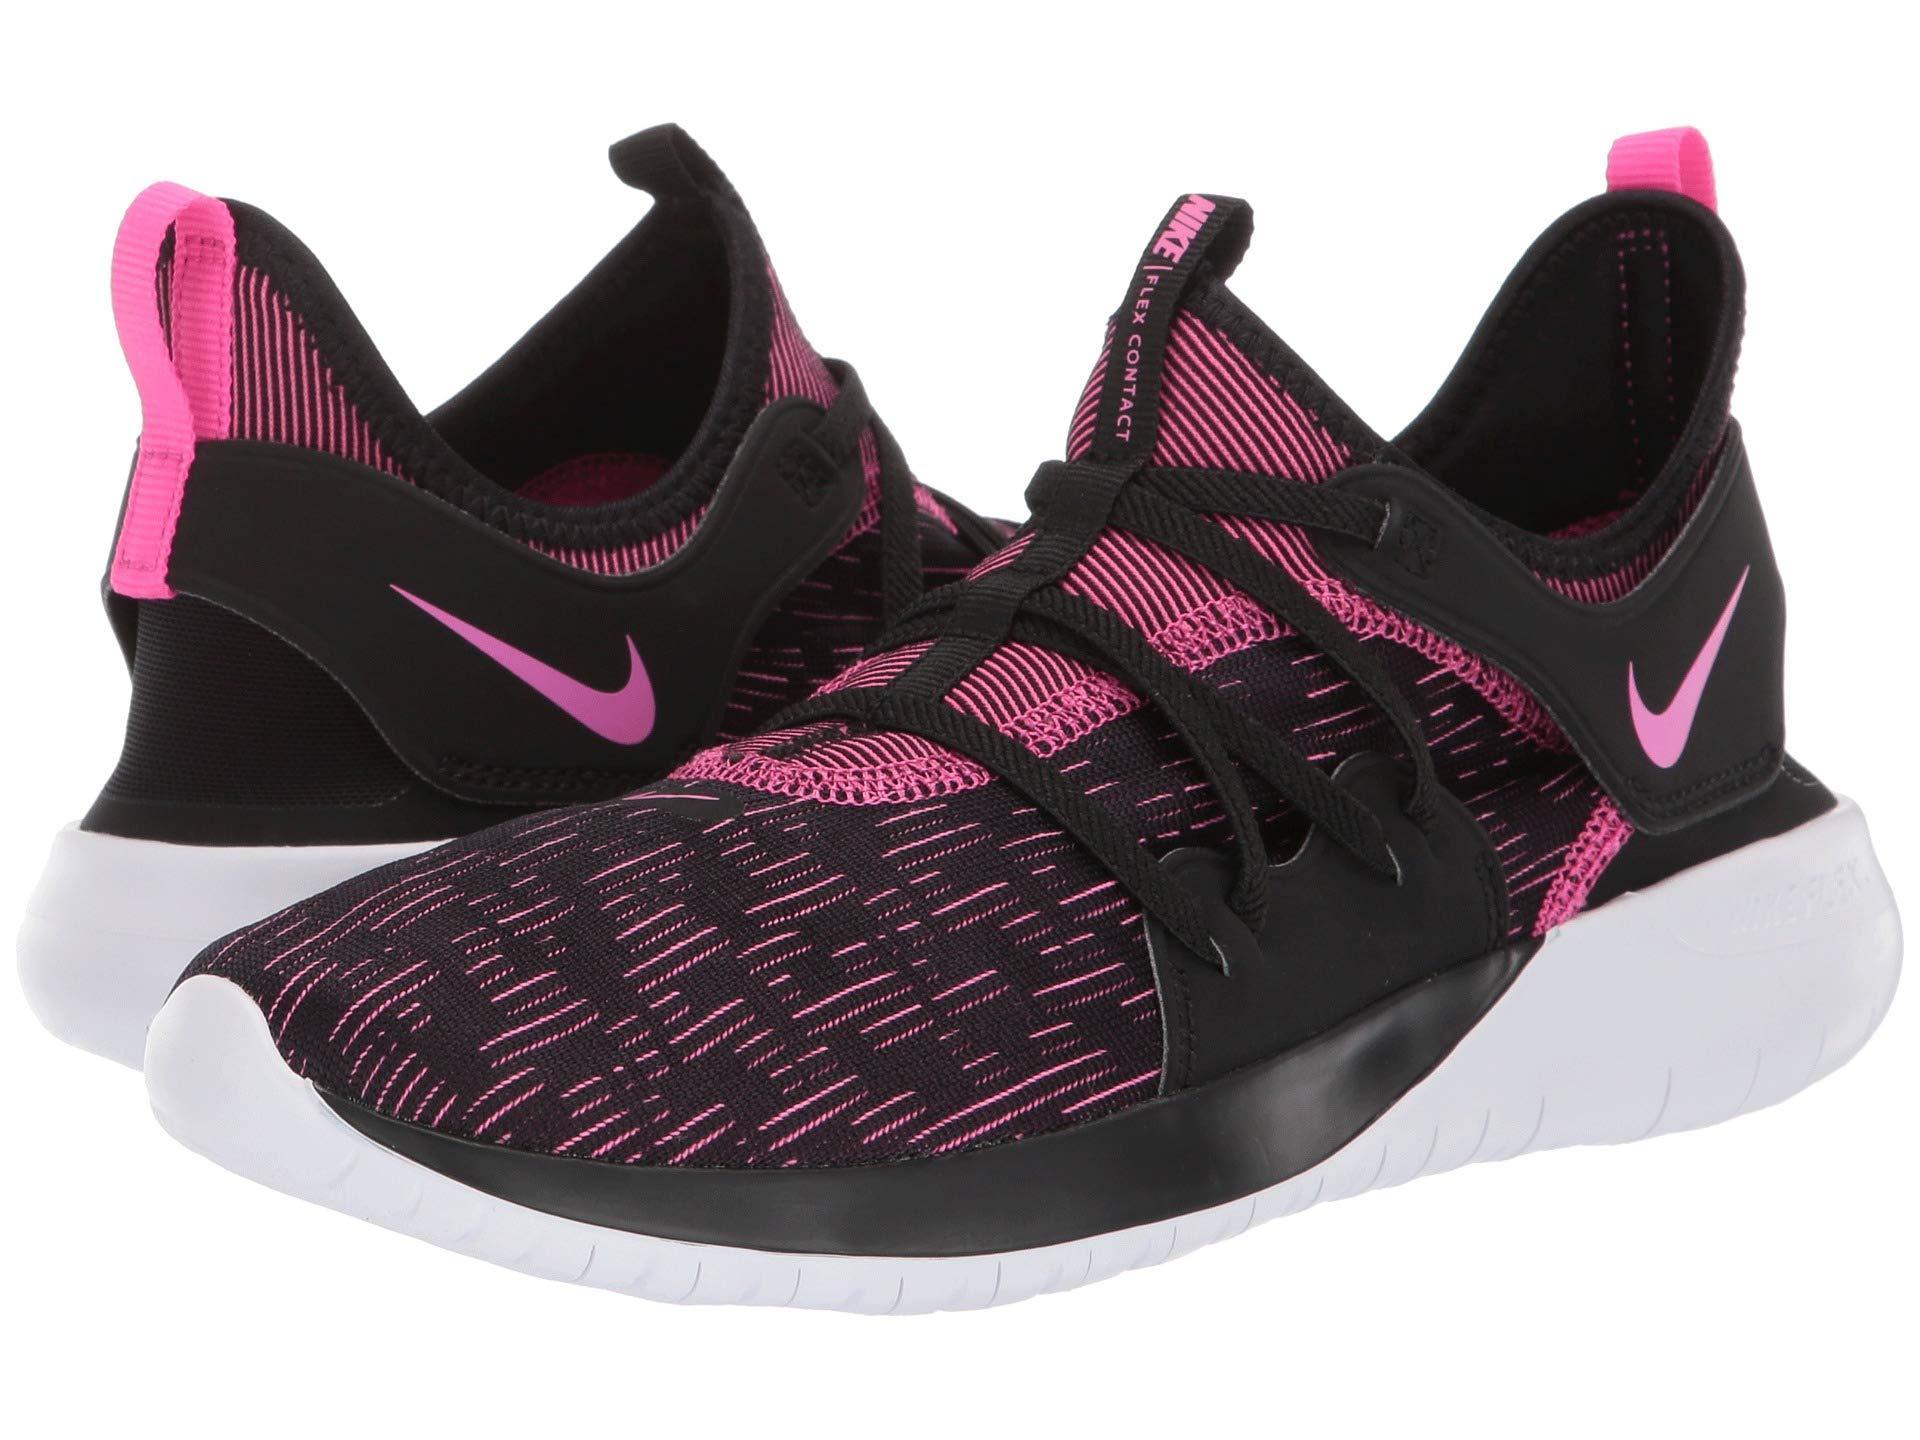 f856388d62a1 Nike - Flex Contact 3 (black laser Fuchsia white) Women s Running Shoes.  View fullscreen